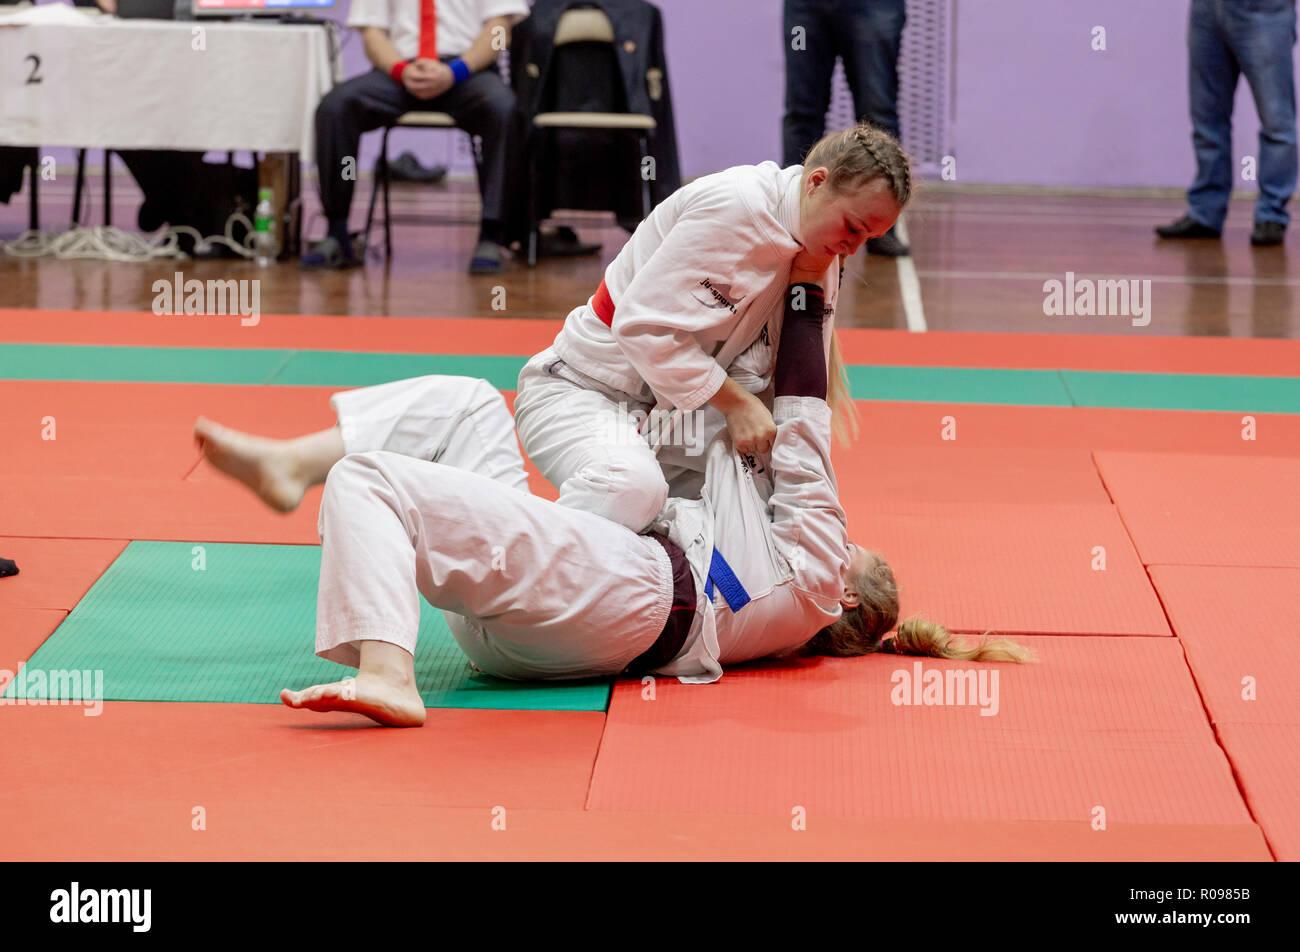 Russia, Vladivostok, 11/03/2018. Jiu-Jitsu wrestling competition among women. Martial arts and fighting sports tournament. - Stock Image